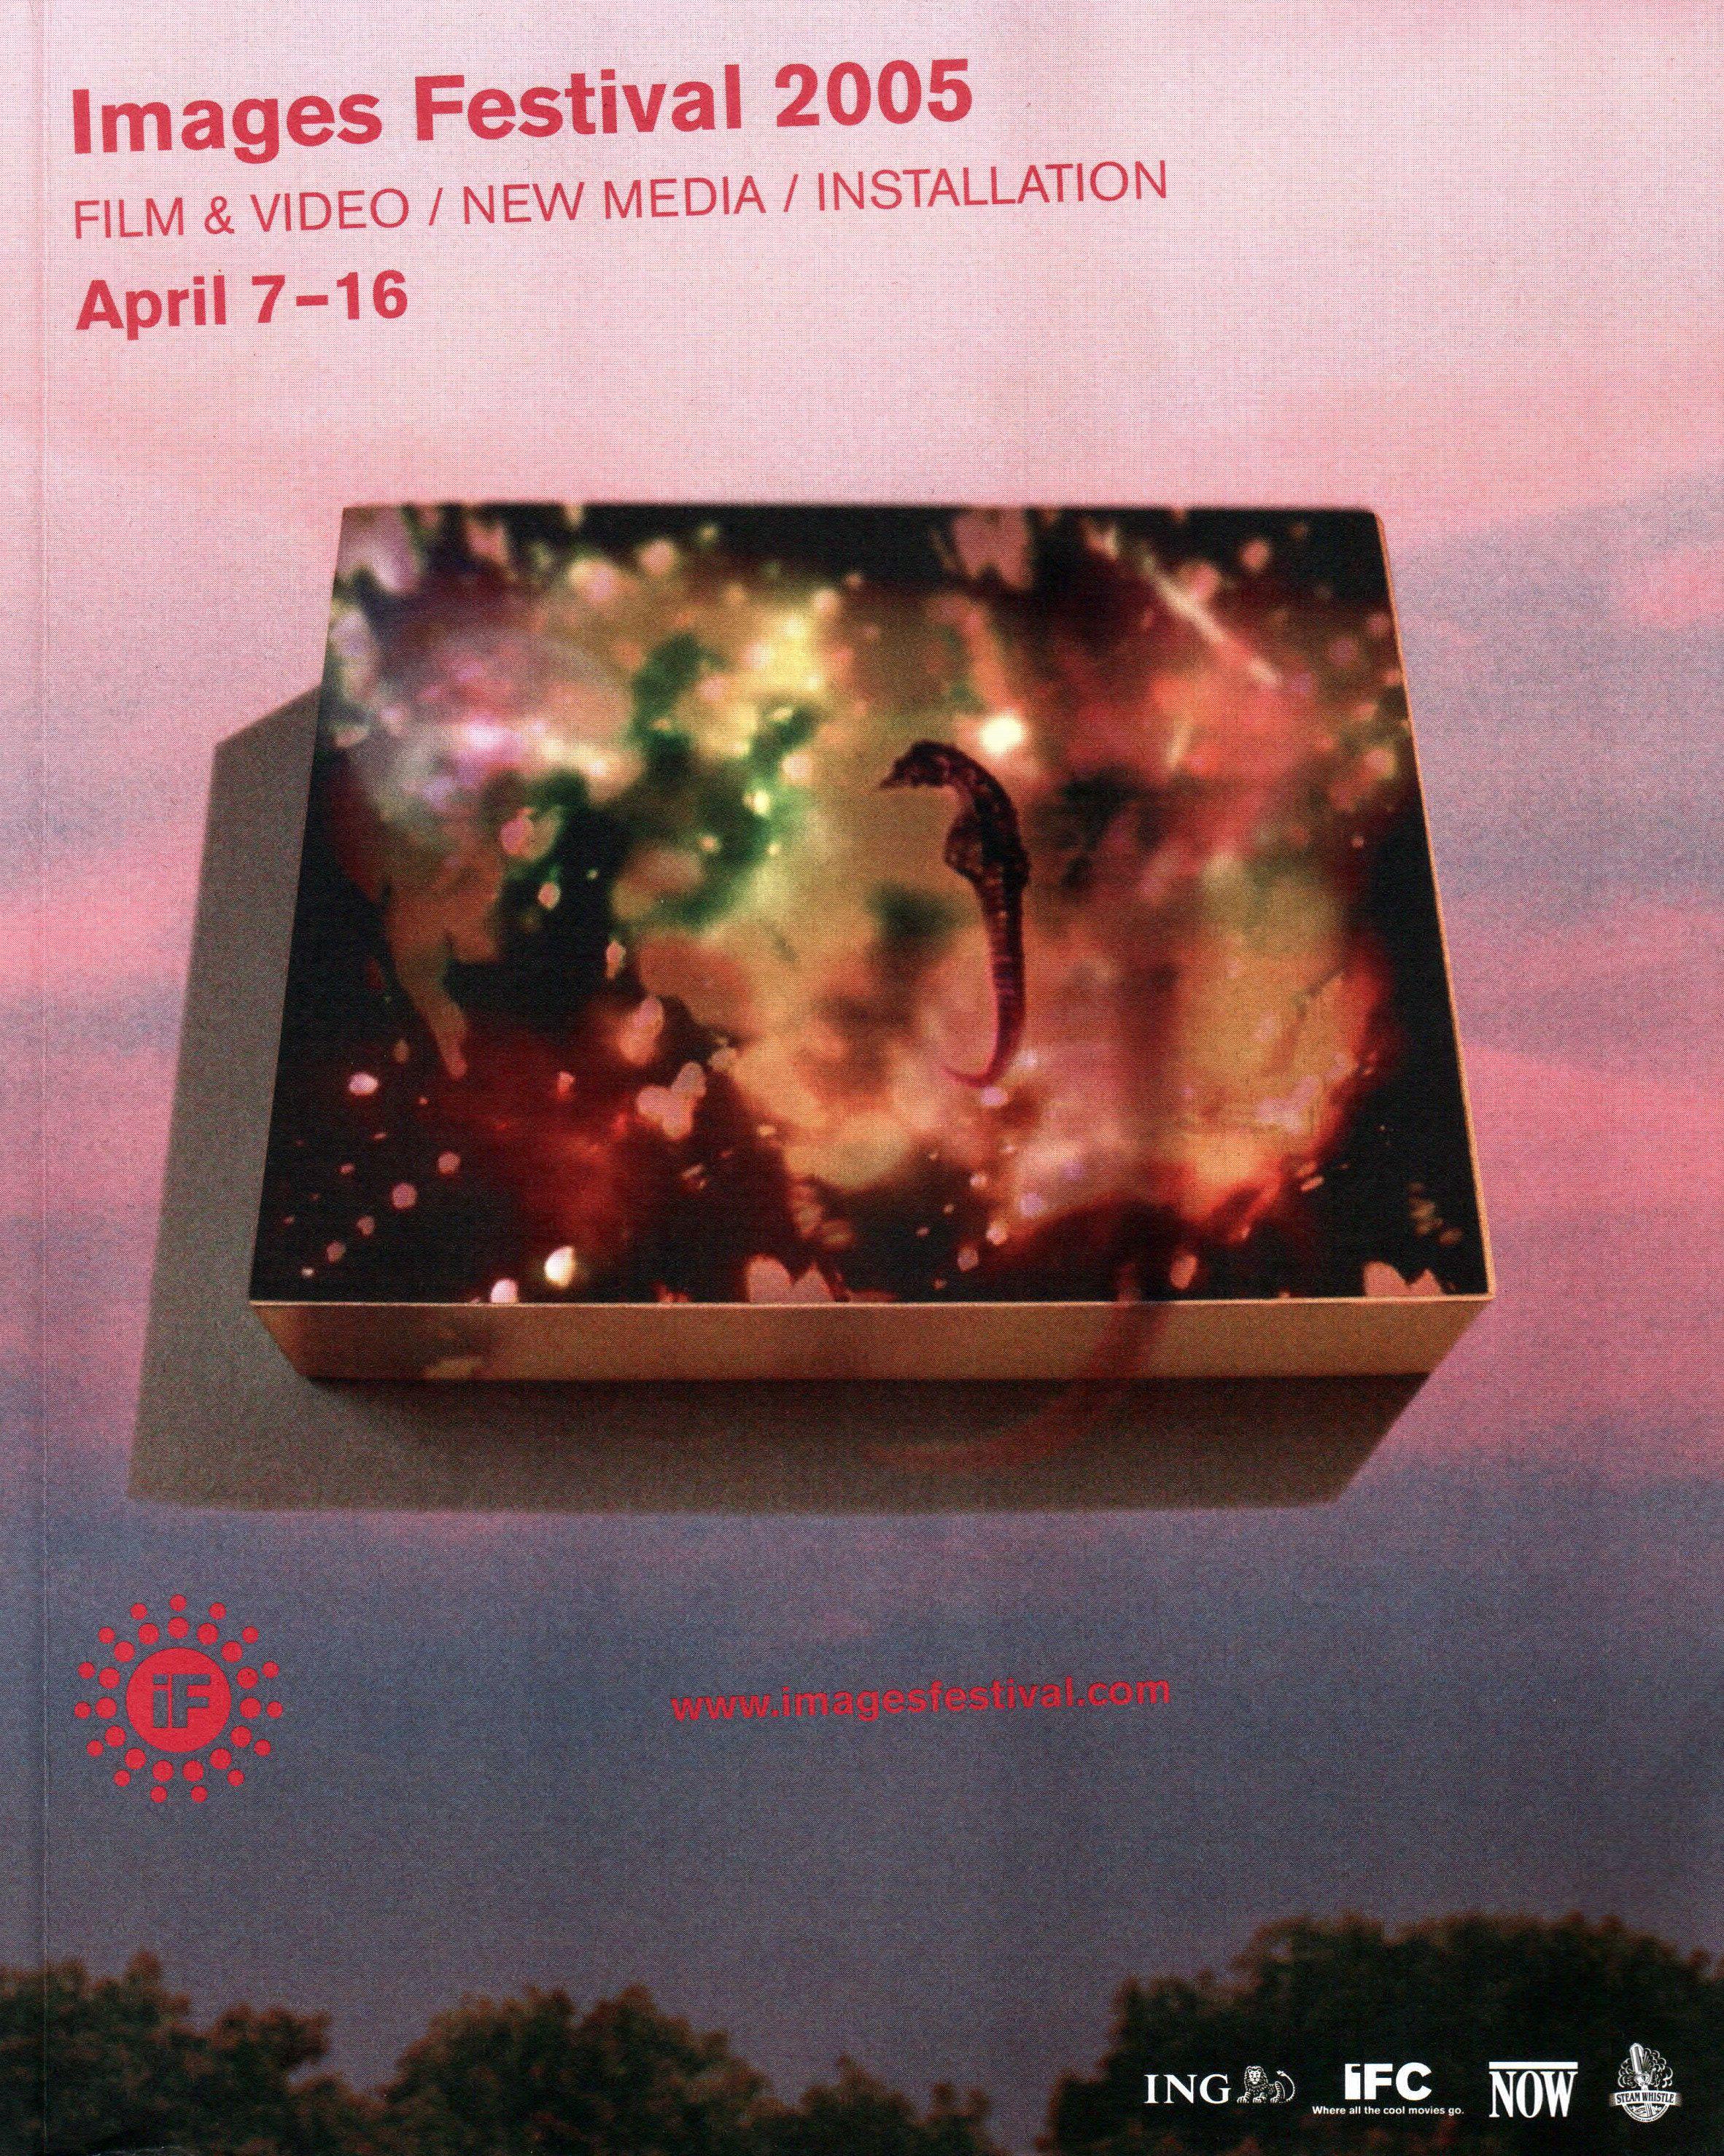 Images Festival Archive (2005)